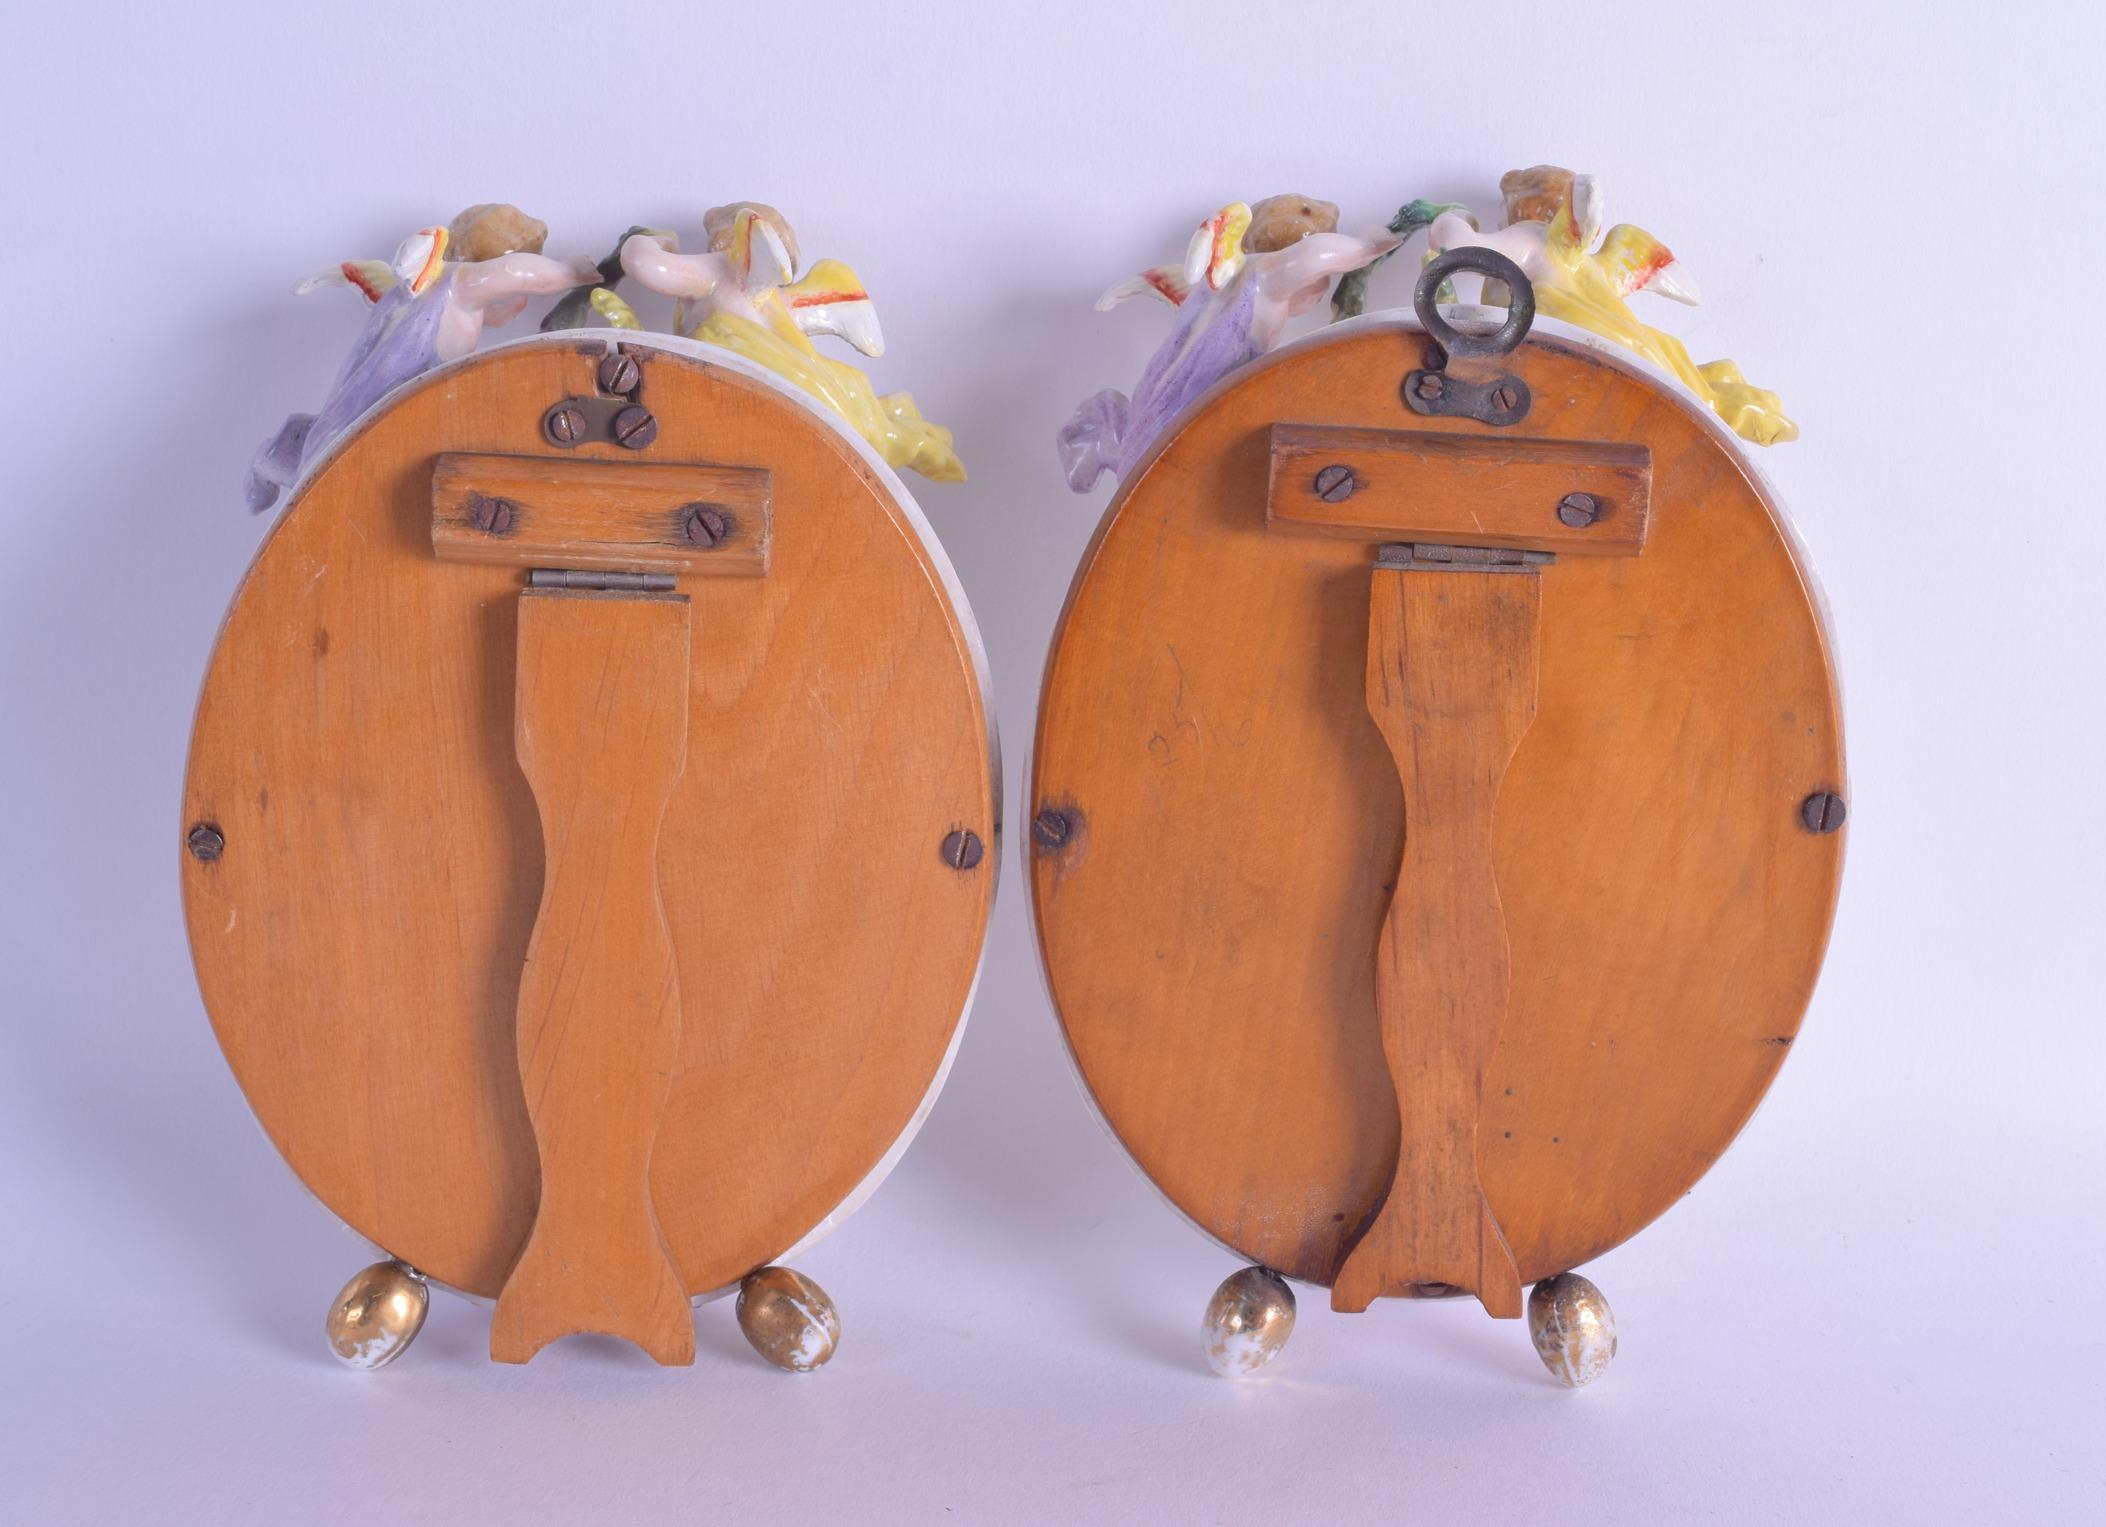 Lot 155 - 19th c. Sitzendorf pair of table mirror surmounted by winged cherubs. 16cm high